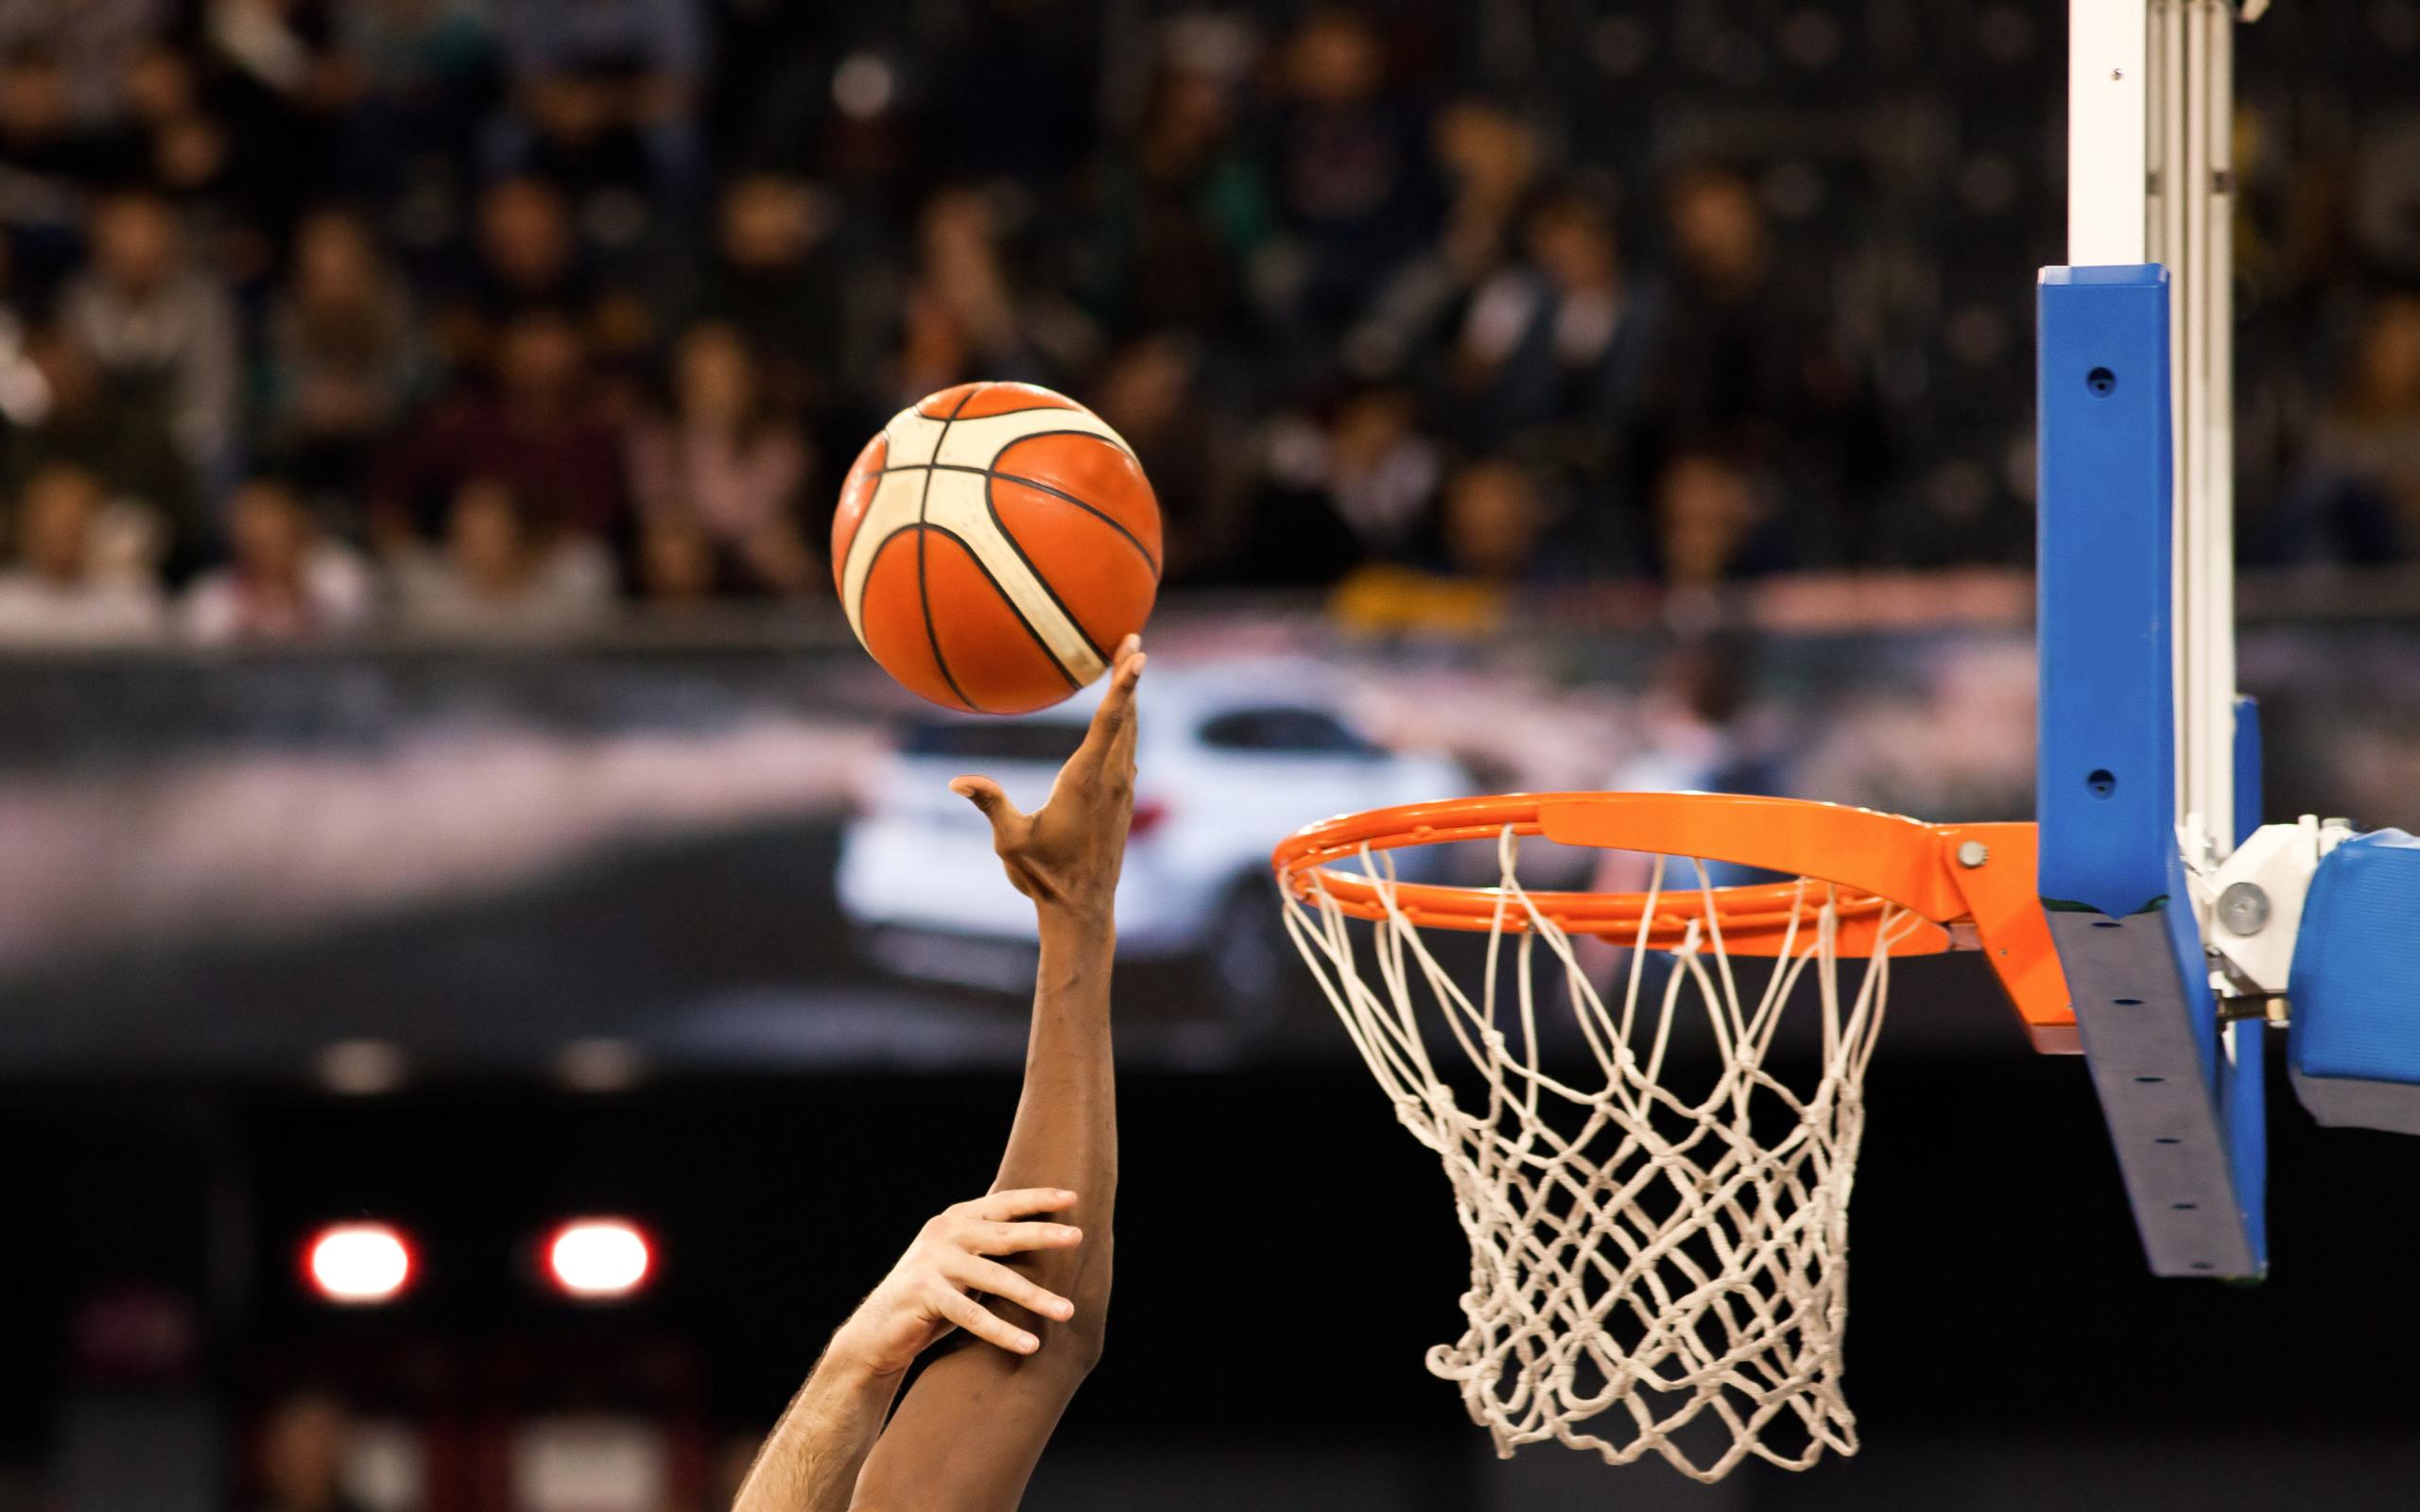 adobe stock basketball and hoop